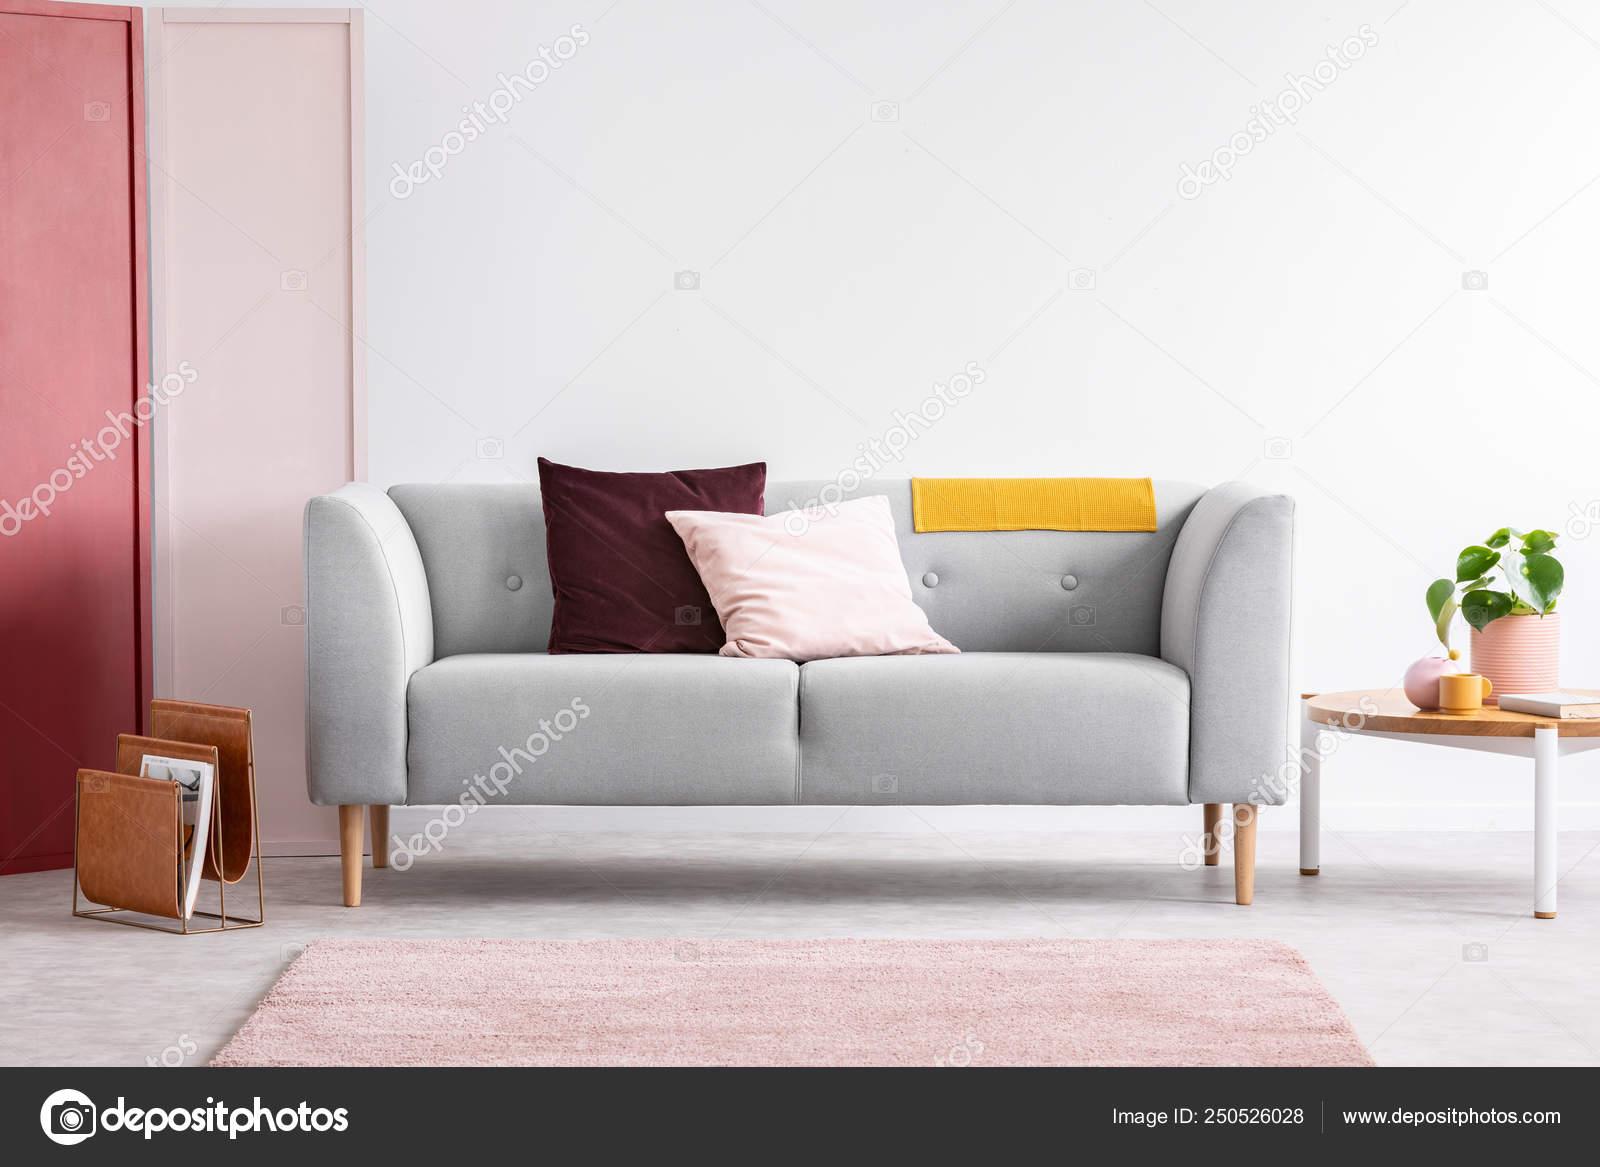 Peachy Pastel Pink And Burgundy Pillows On Grey Sofa In Elegant Dailytribune Chair Design For Home Dailytribuneorg